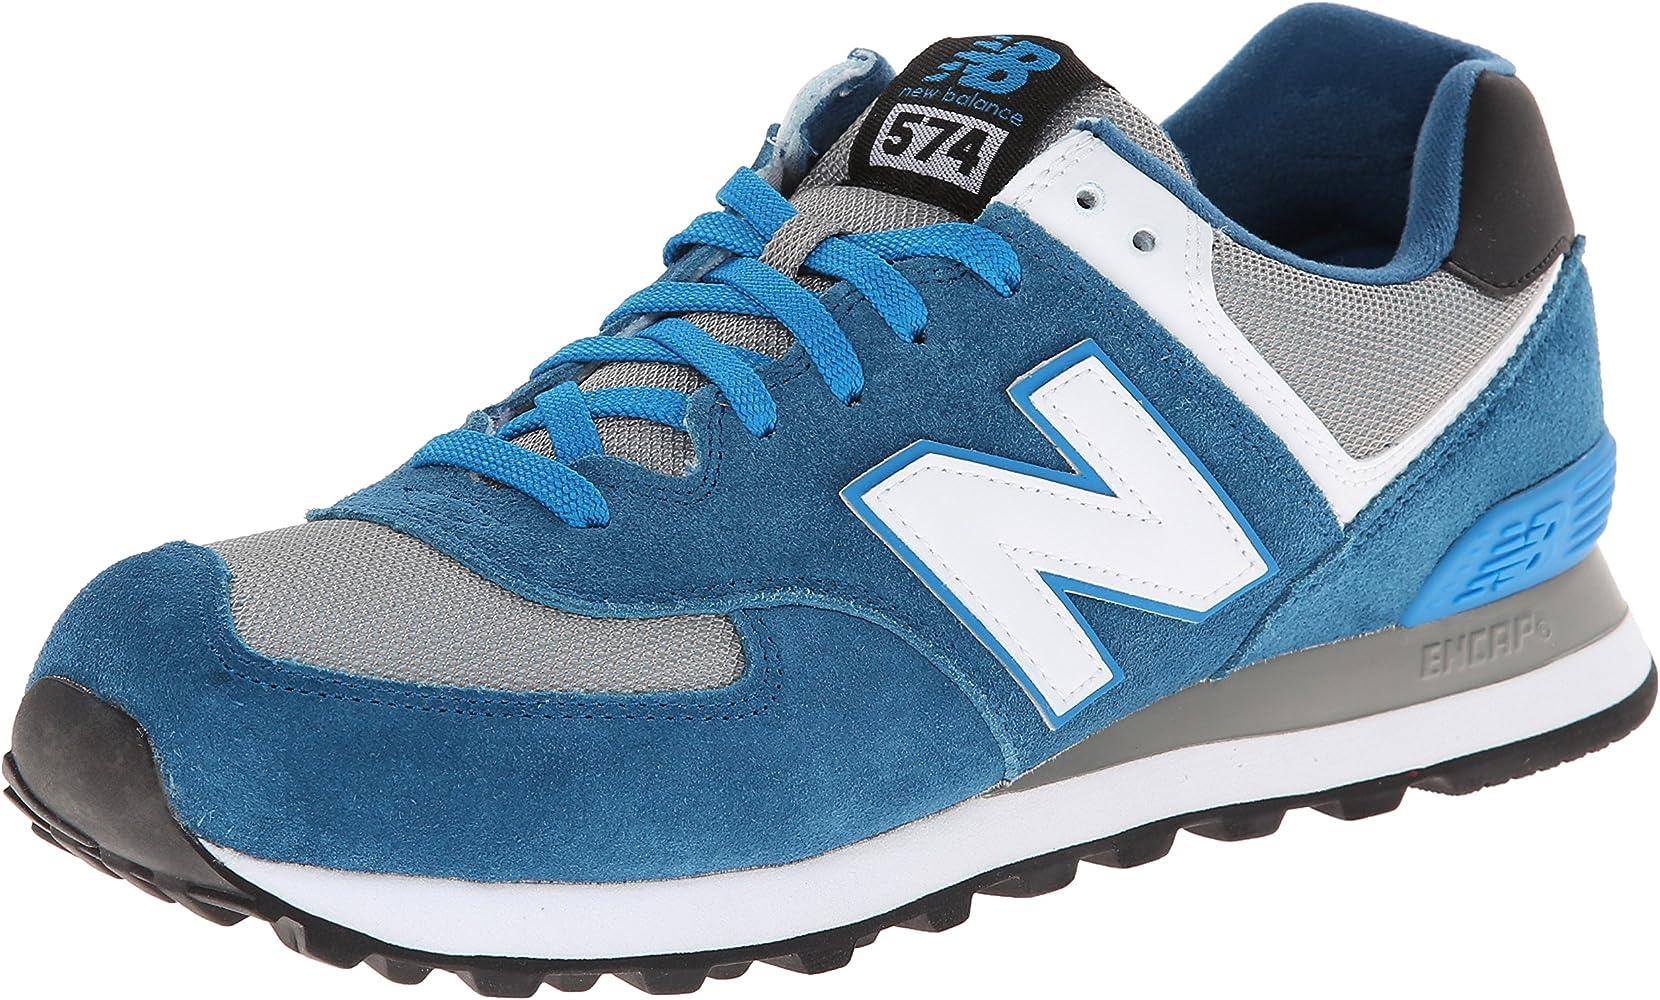 quality design fb98d 63281 ML574 D Herren Sneaker